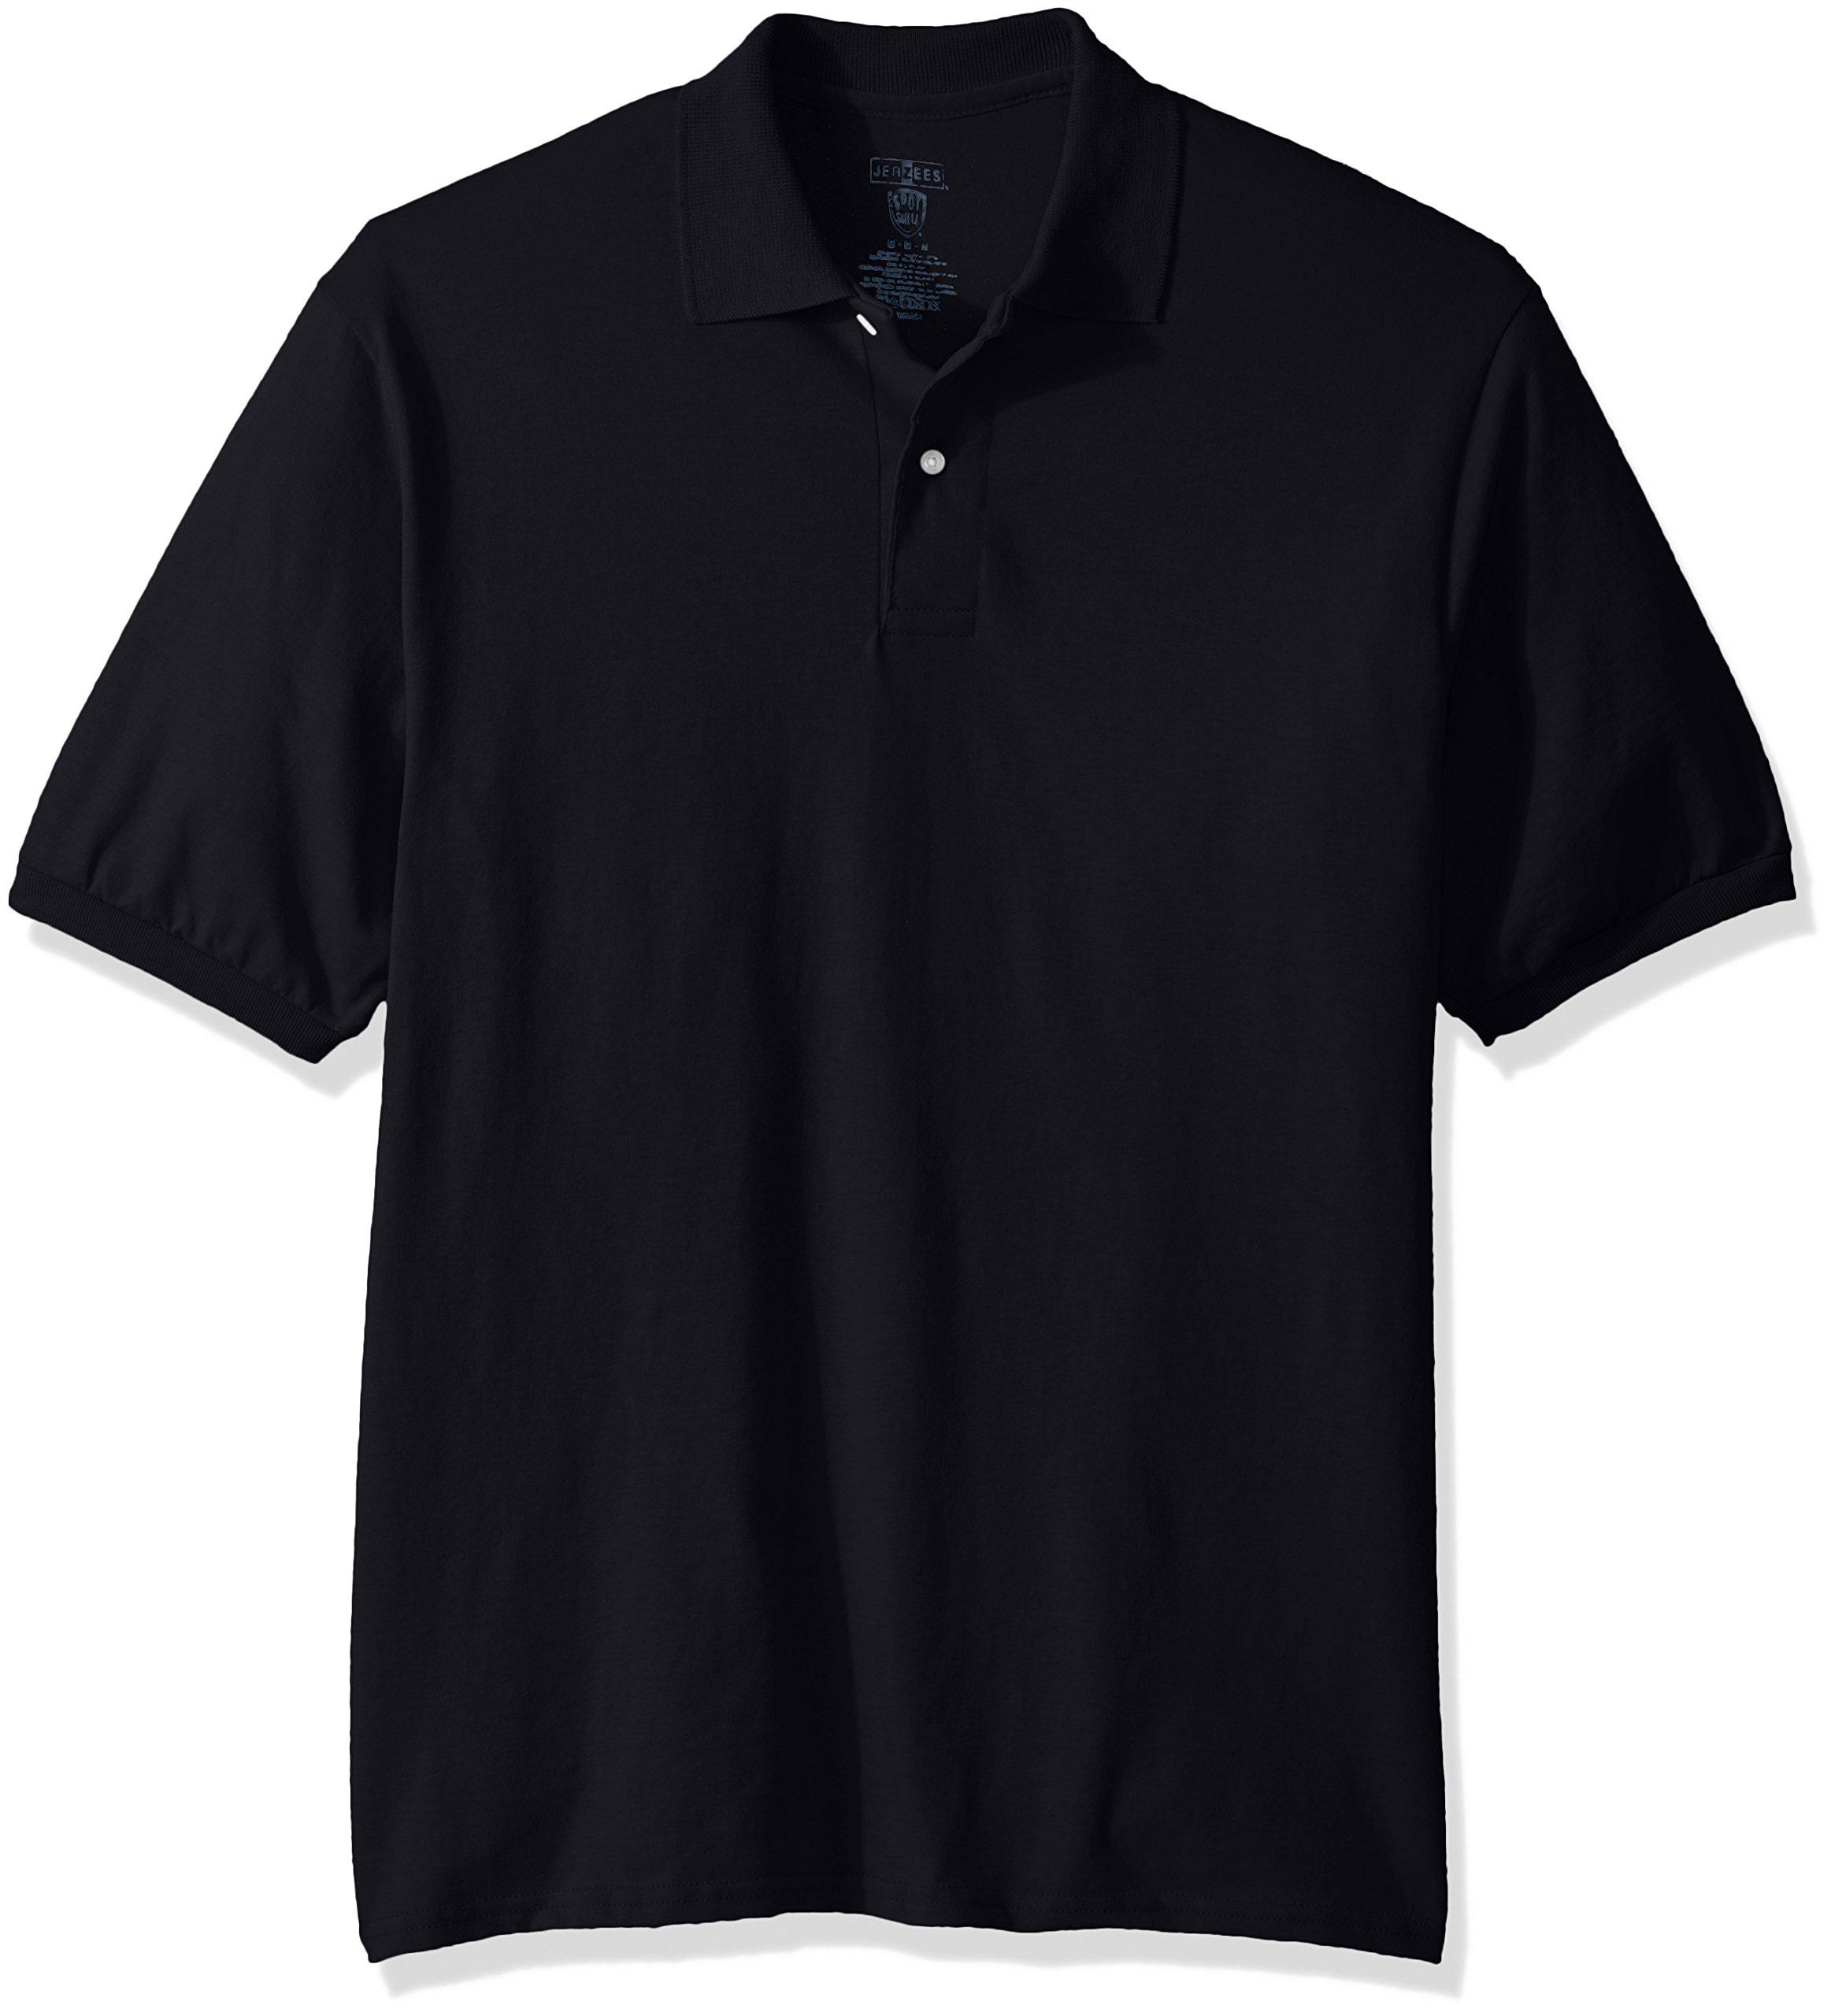 Jerzees Men's Spot Shield Short Sleeve Polo Sport Shirt, Black, 5X-Large